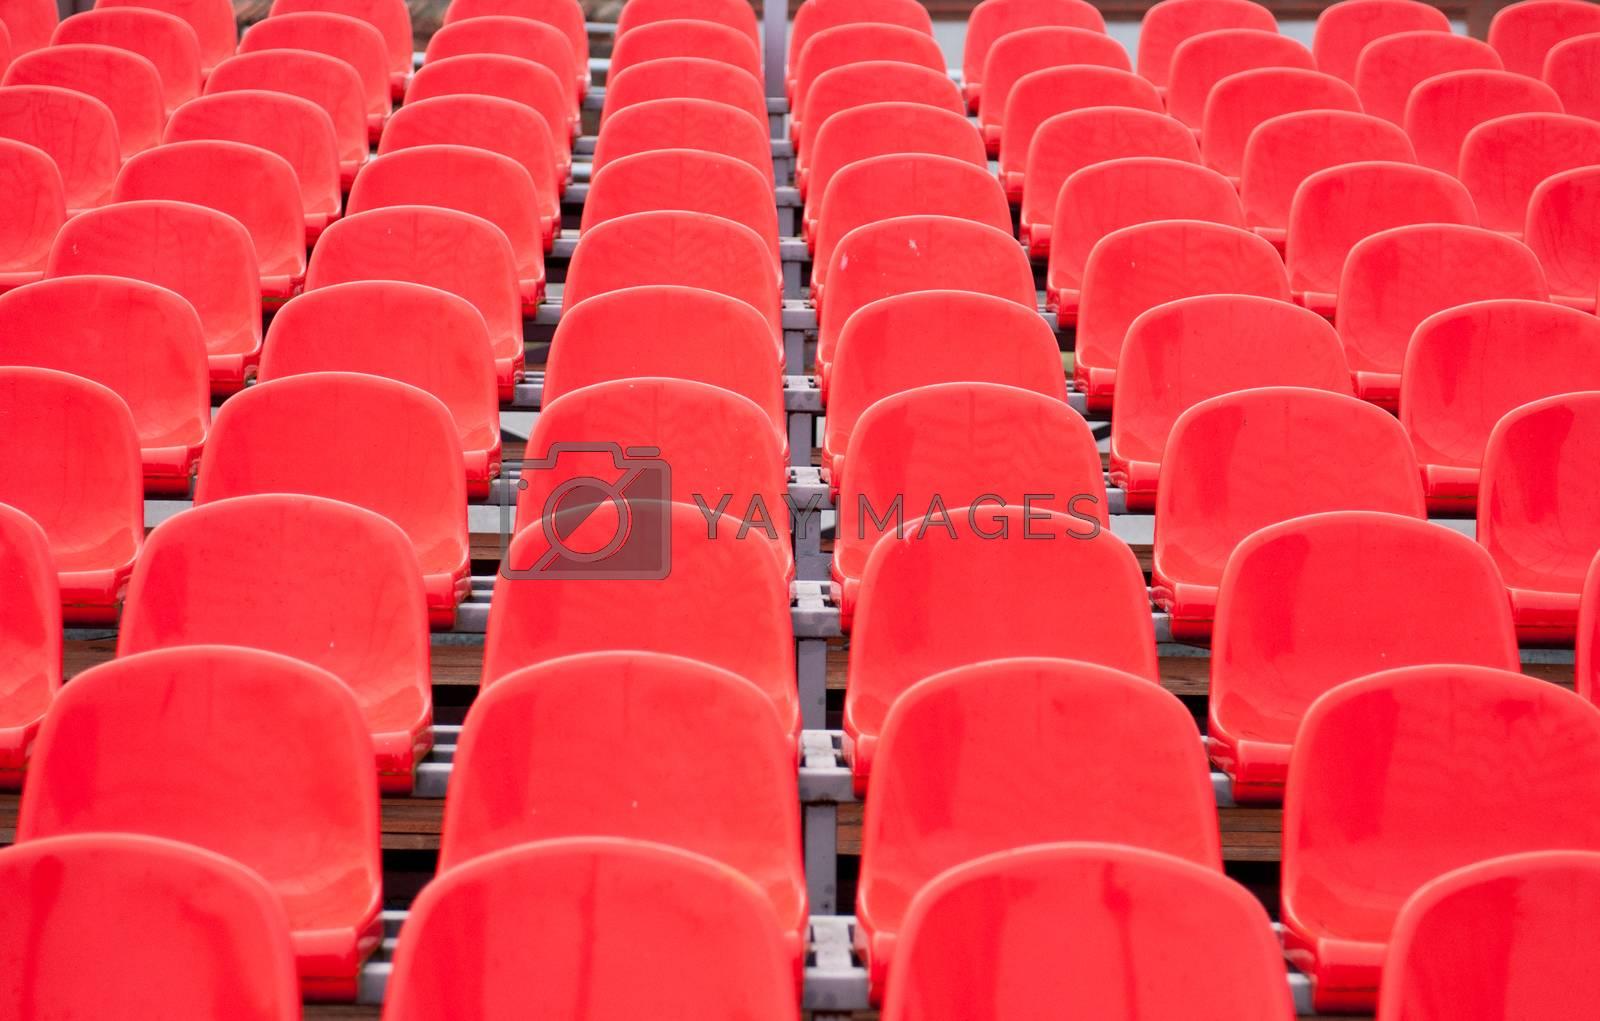 Empty bright red plastic seats in a stadium.